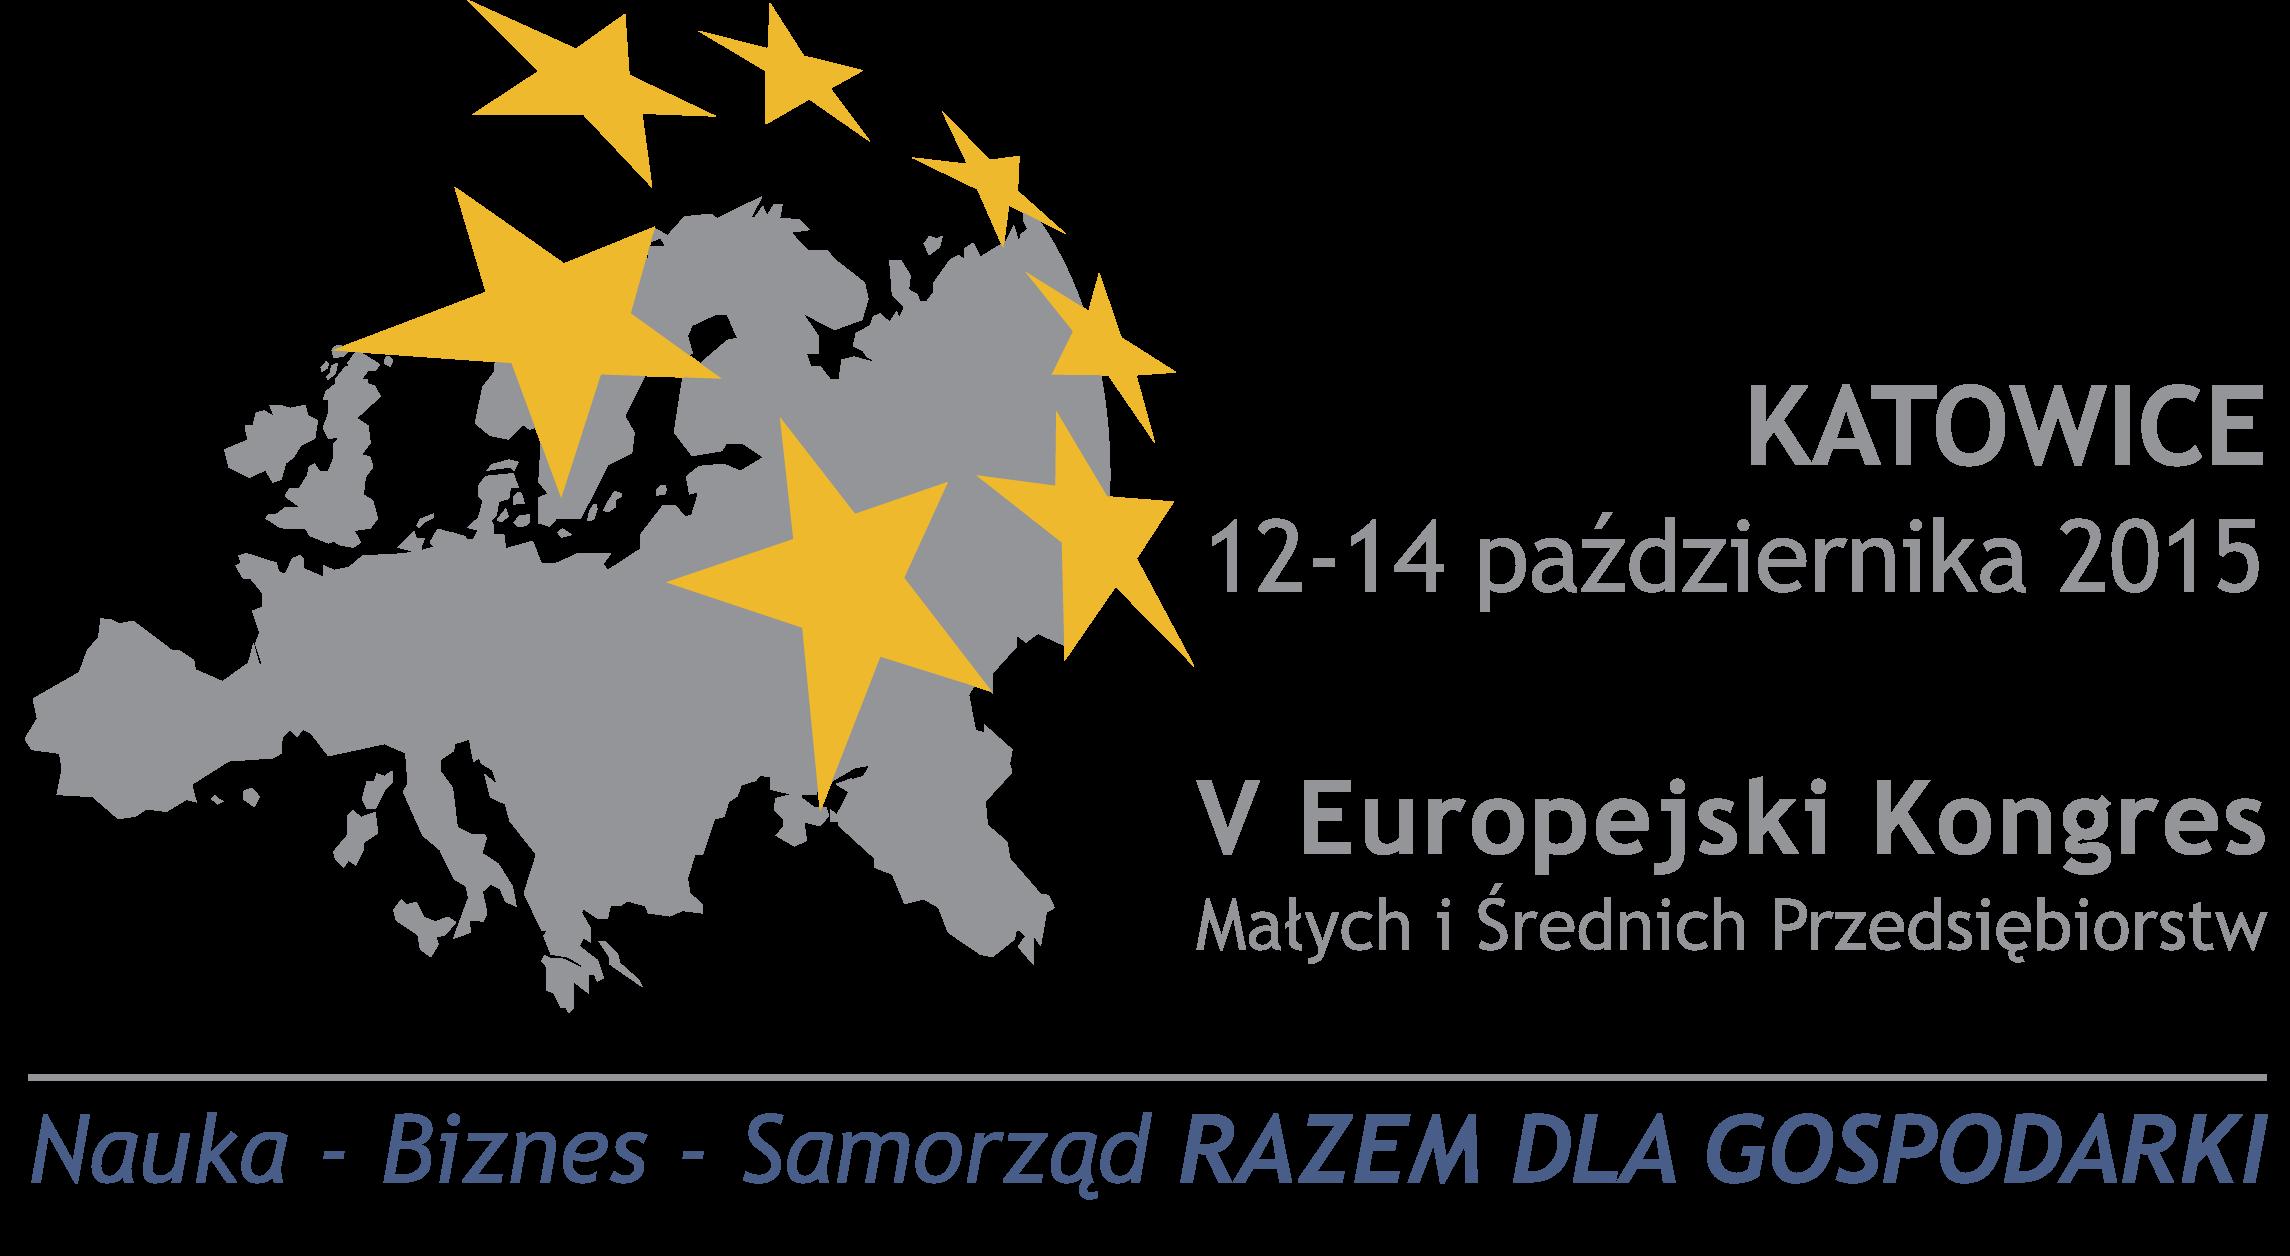 Katowice centrum Europy?